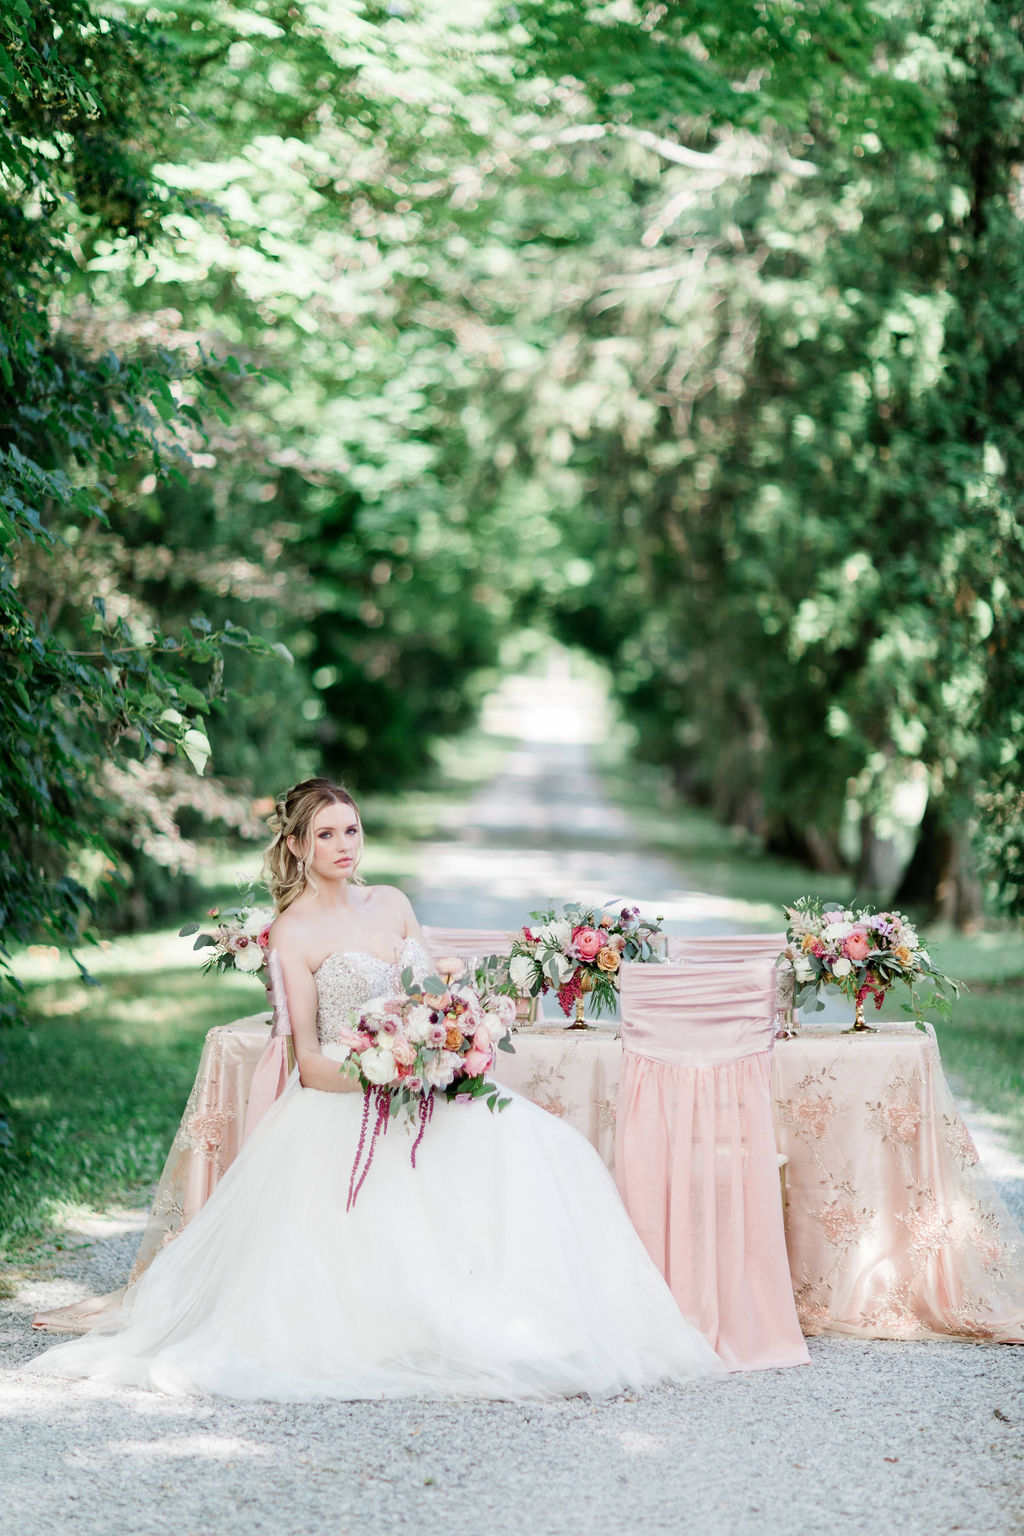 Kurtz-Orchards-Niagara-on-the-Lake-Styled-Wedding-Session-Shotlife-Studio-Calderone-Co-Luxury-Events-Vineyard-Bride-08.JPG